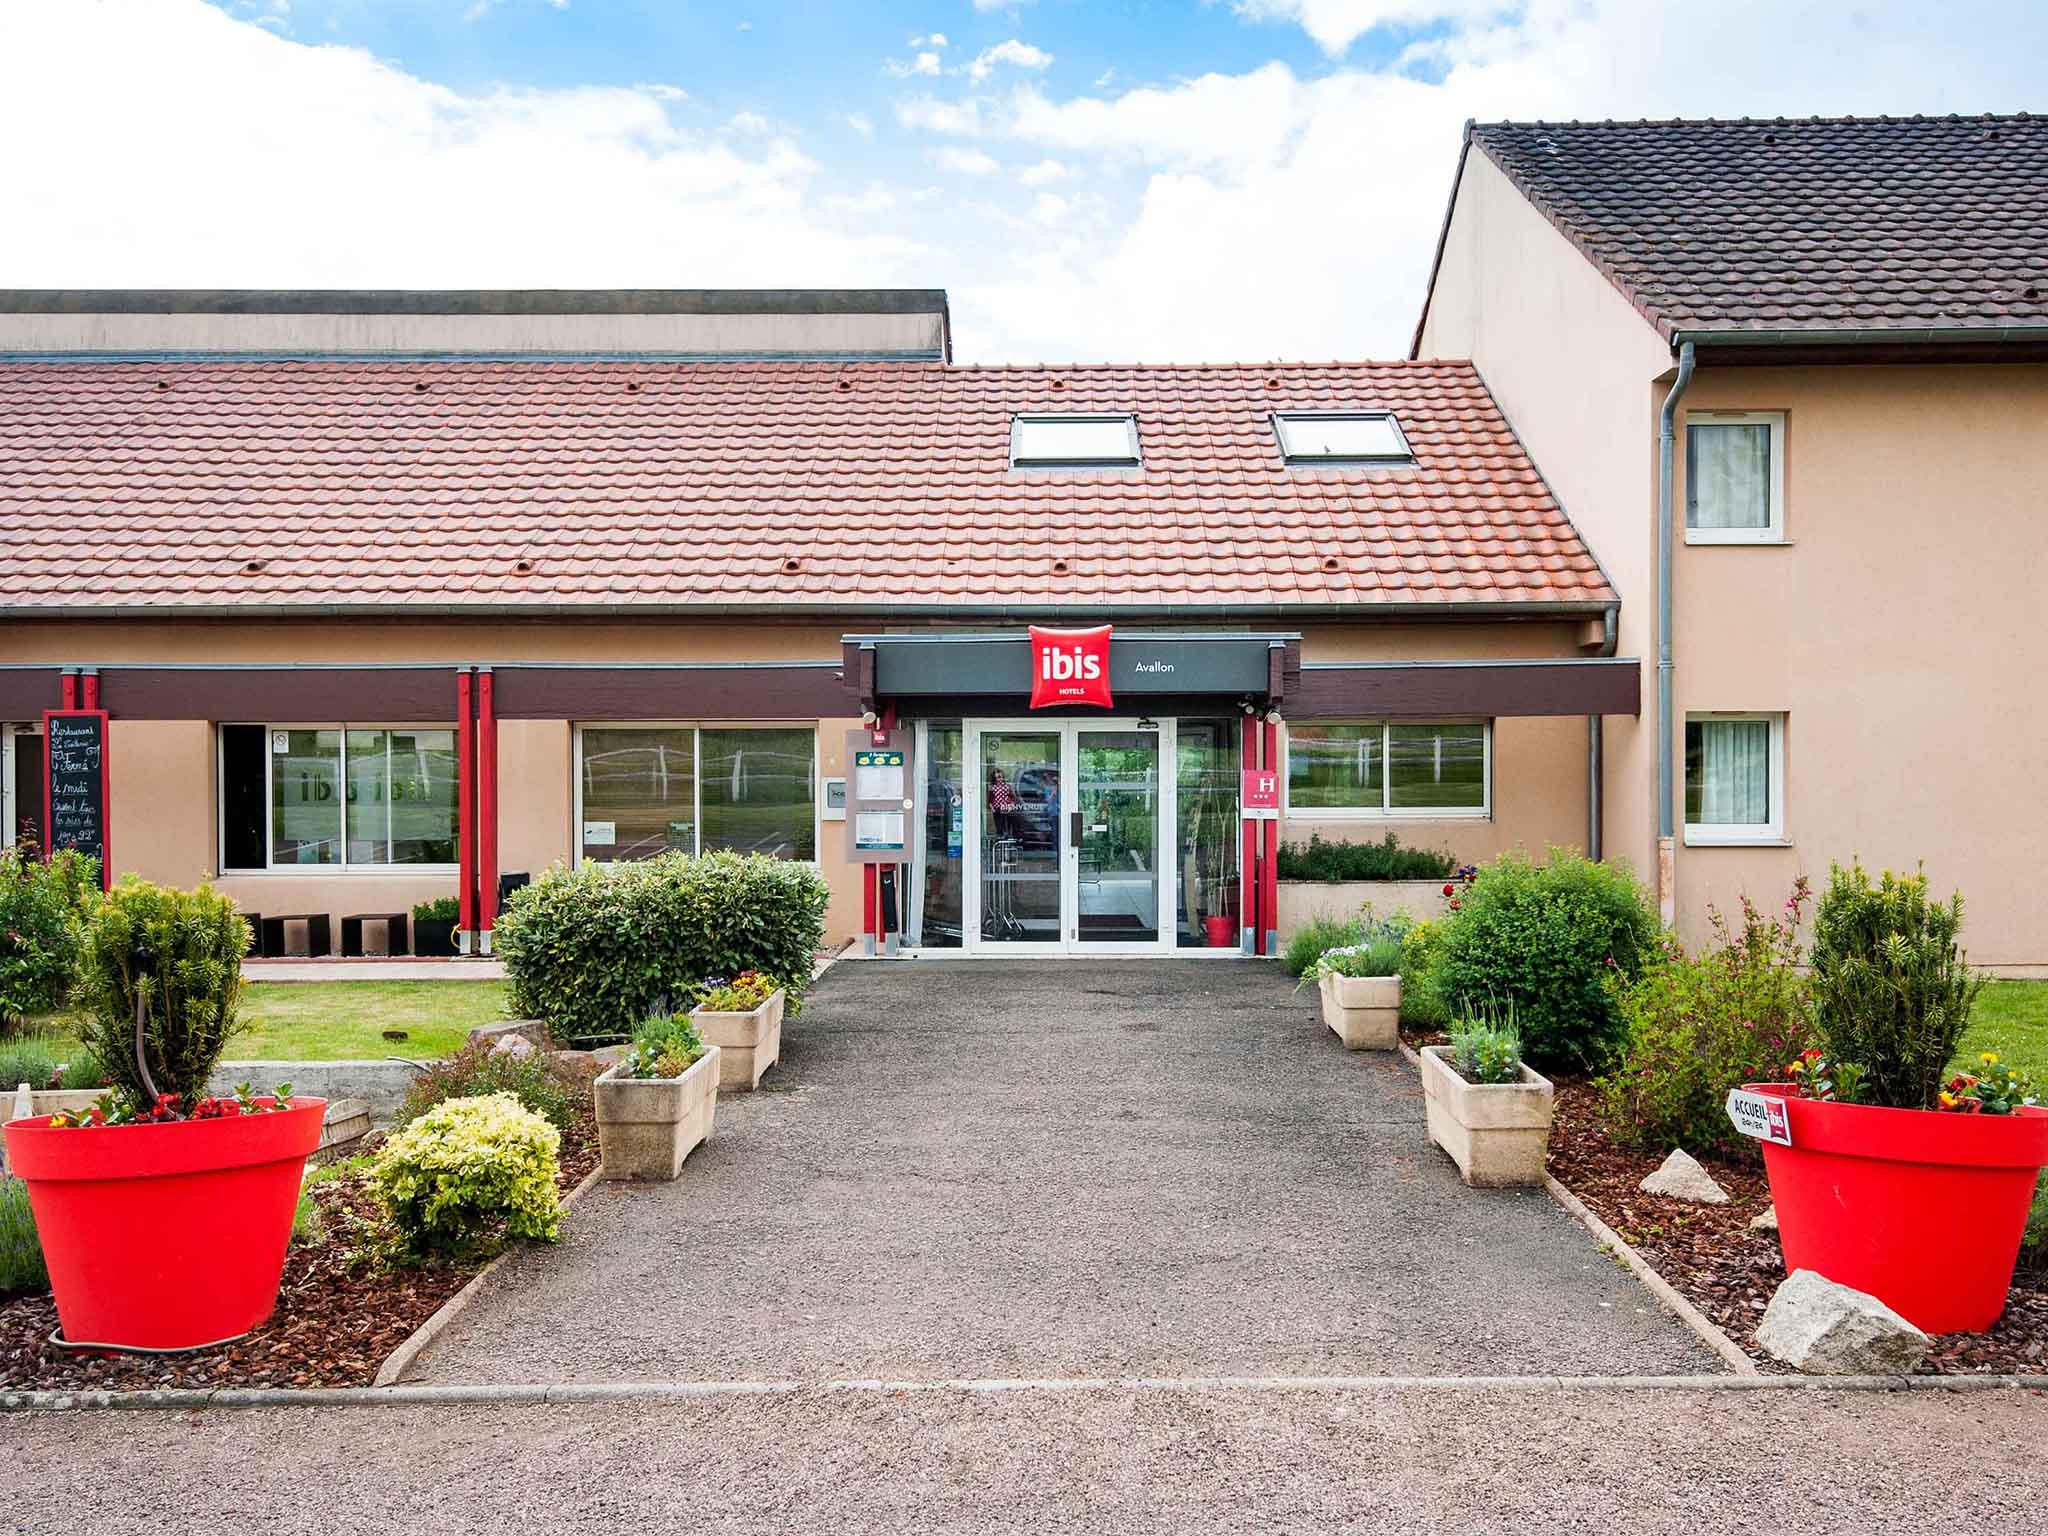 1740 house tripadvisor - Hotel Ibis Avallon